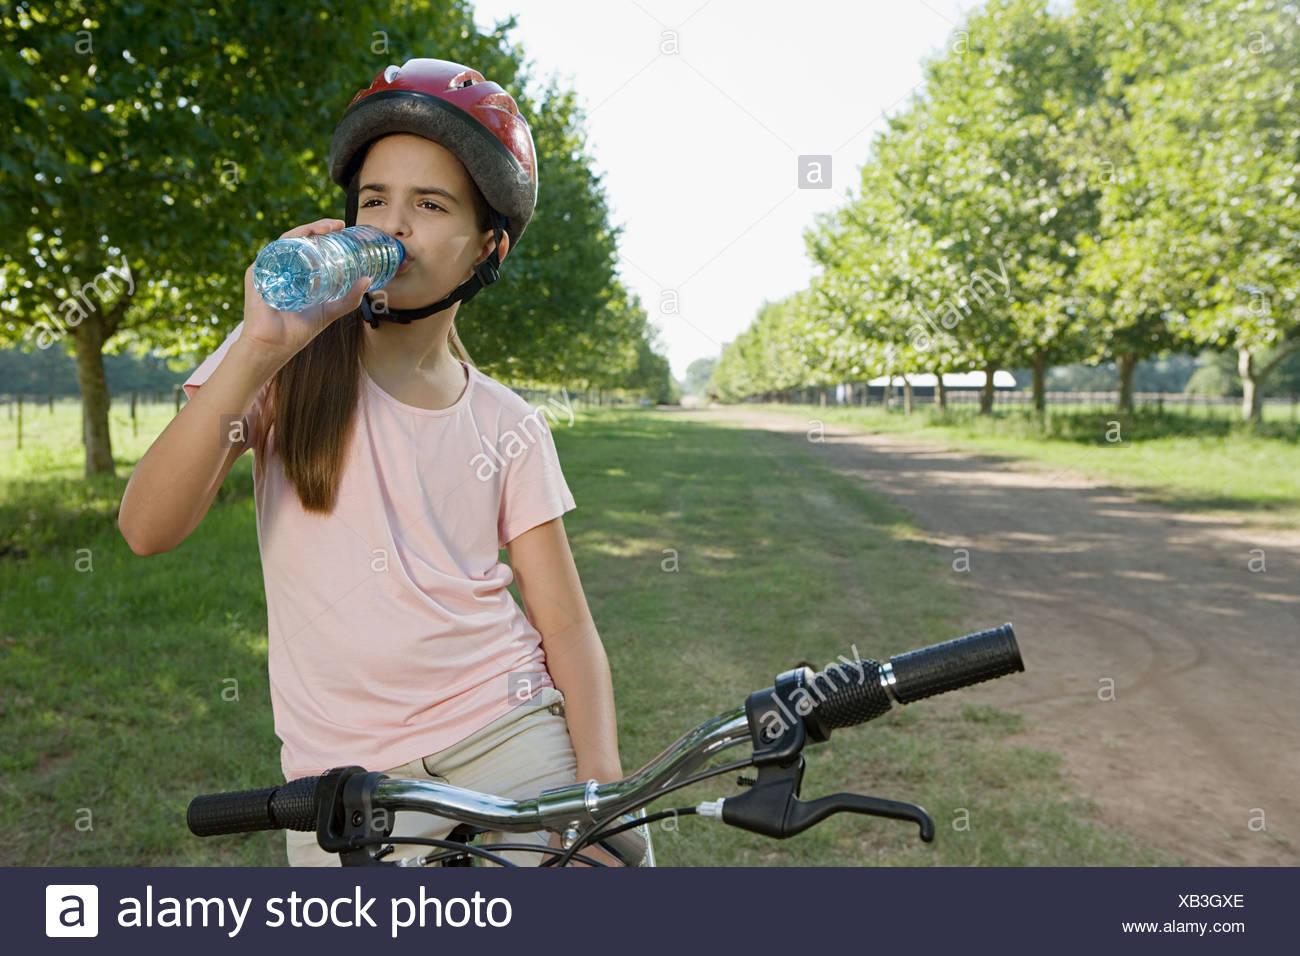 Girl on bike drinking water Stock Photo